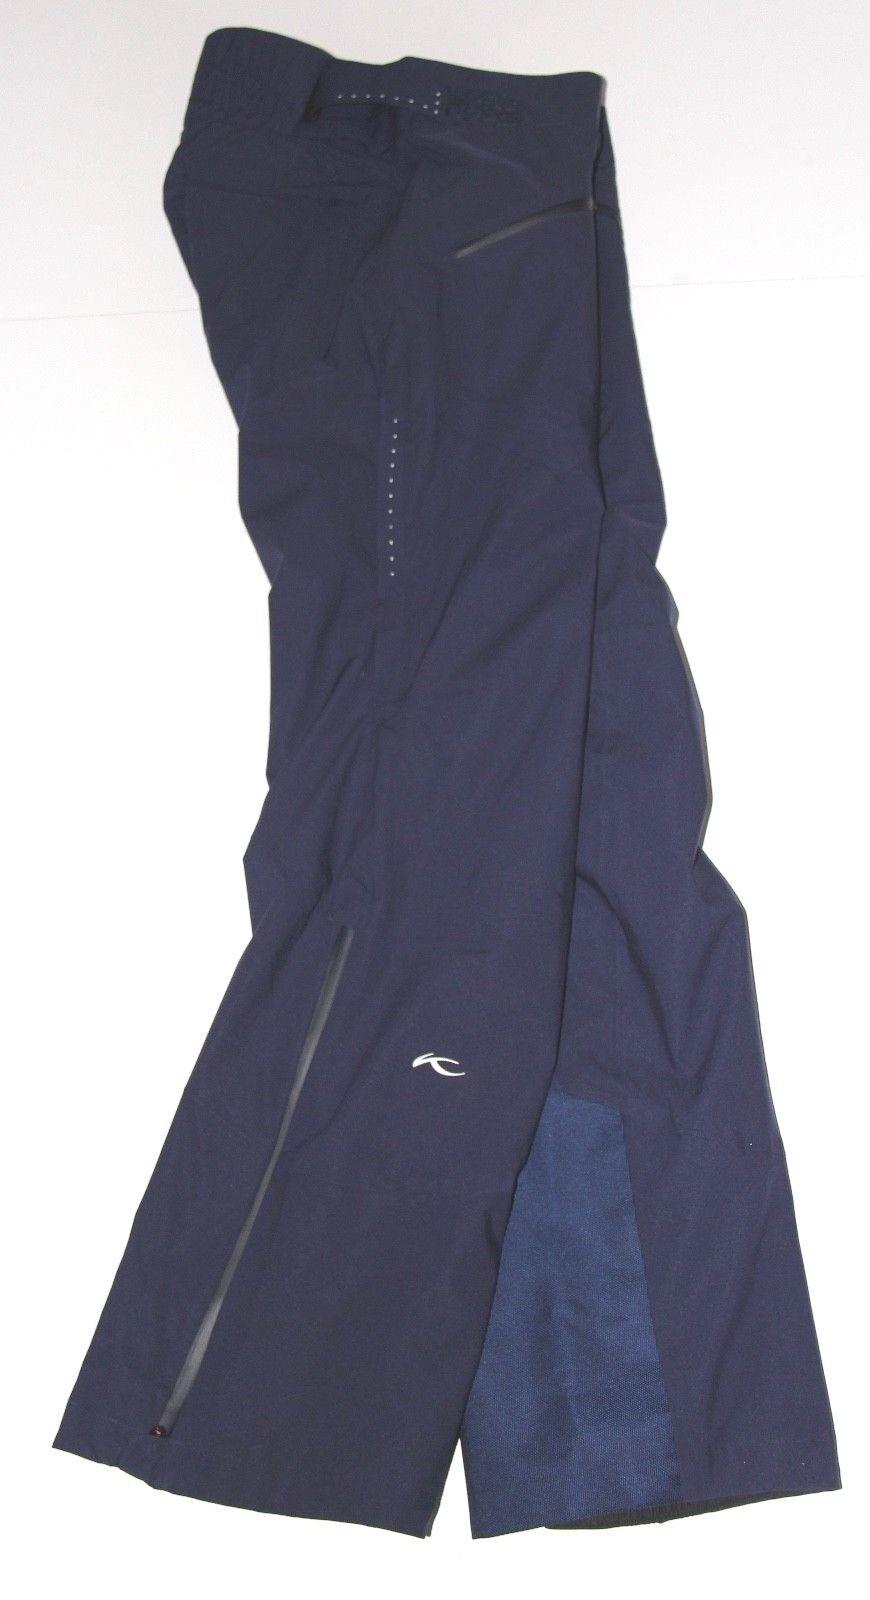 KJUS Women's  FRX Ski Pant Snowboard - Size 40 Large US 10 - Atlanta bluee - NEW  cheap wholesale